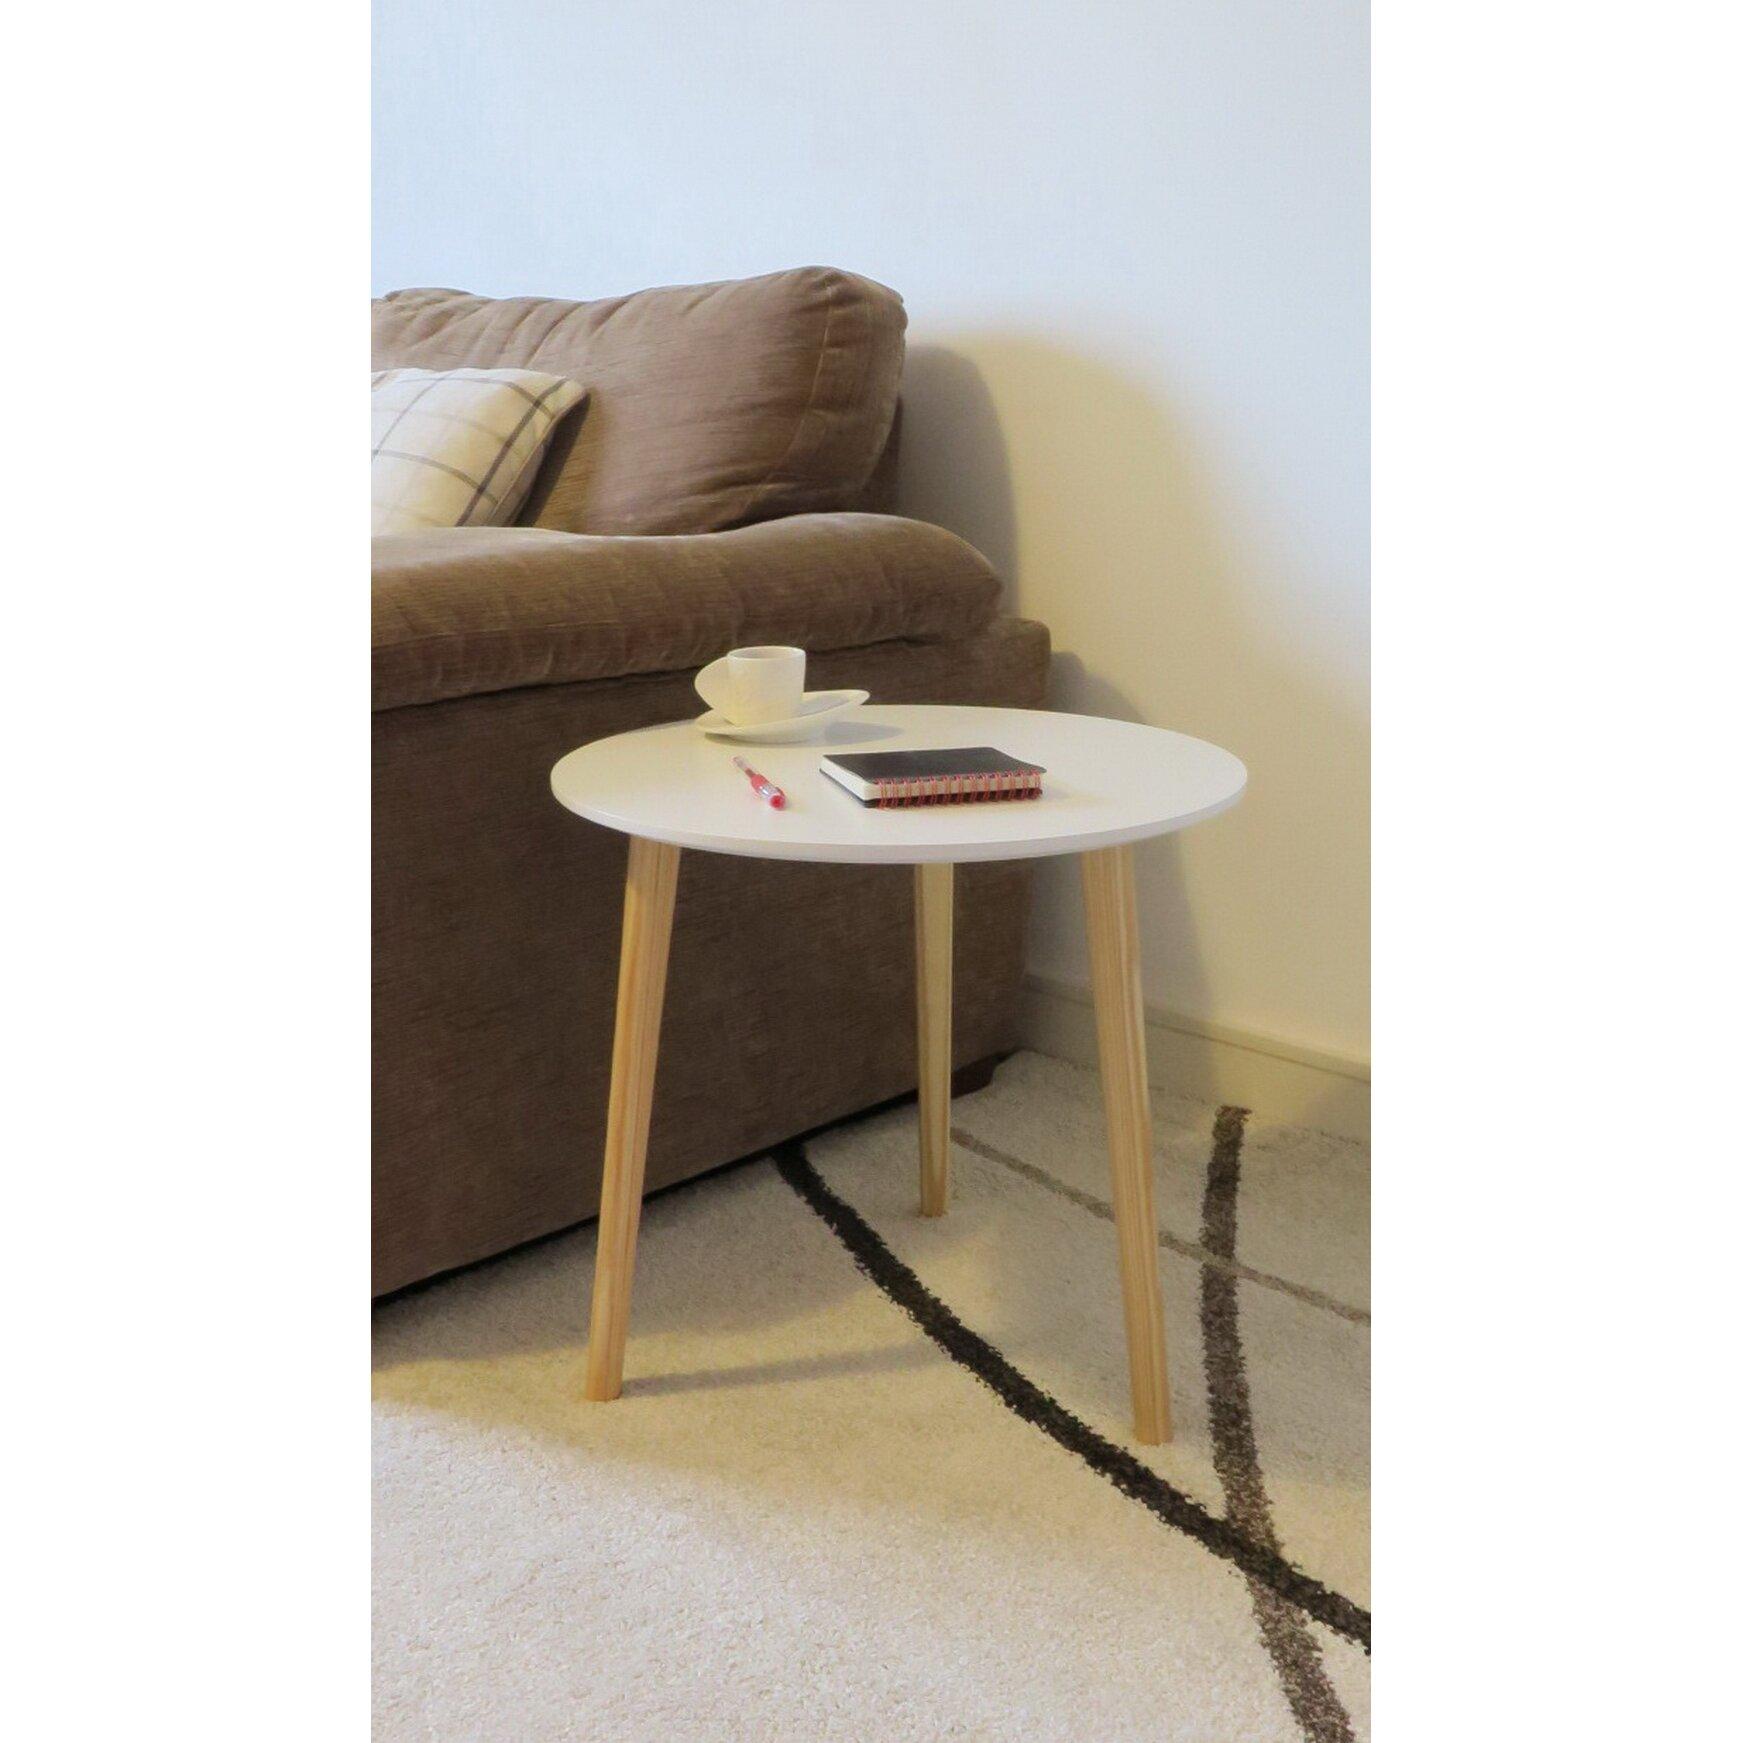 Hokku Designs Tino Round End Table Wayfair UK : Hokku Designs Tino Round End Table from www.wayfair.co.uk size 1743 x 1743 jpeg 196kB